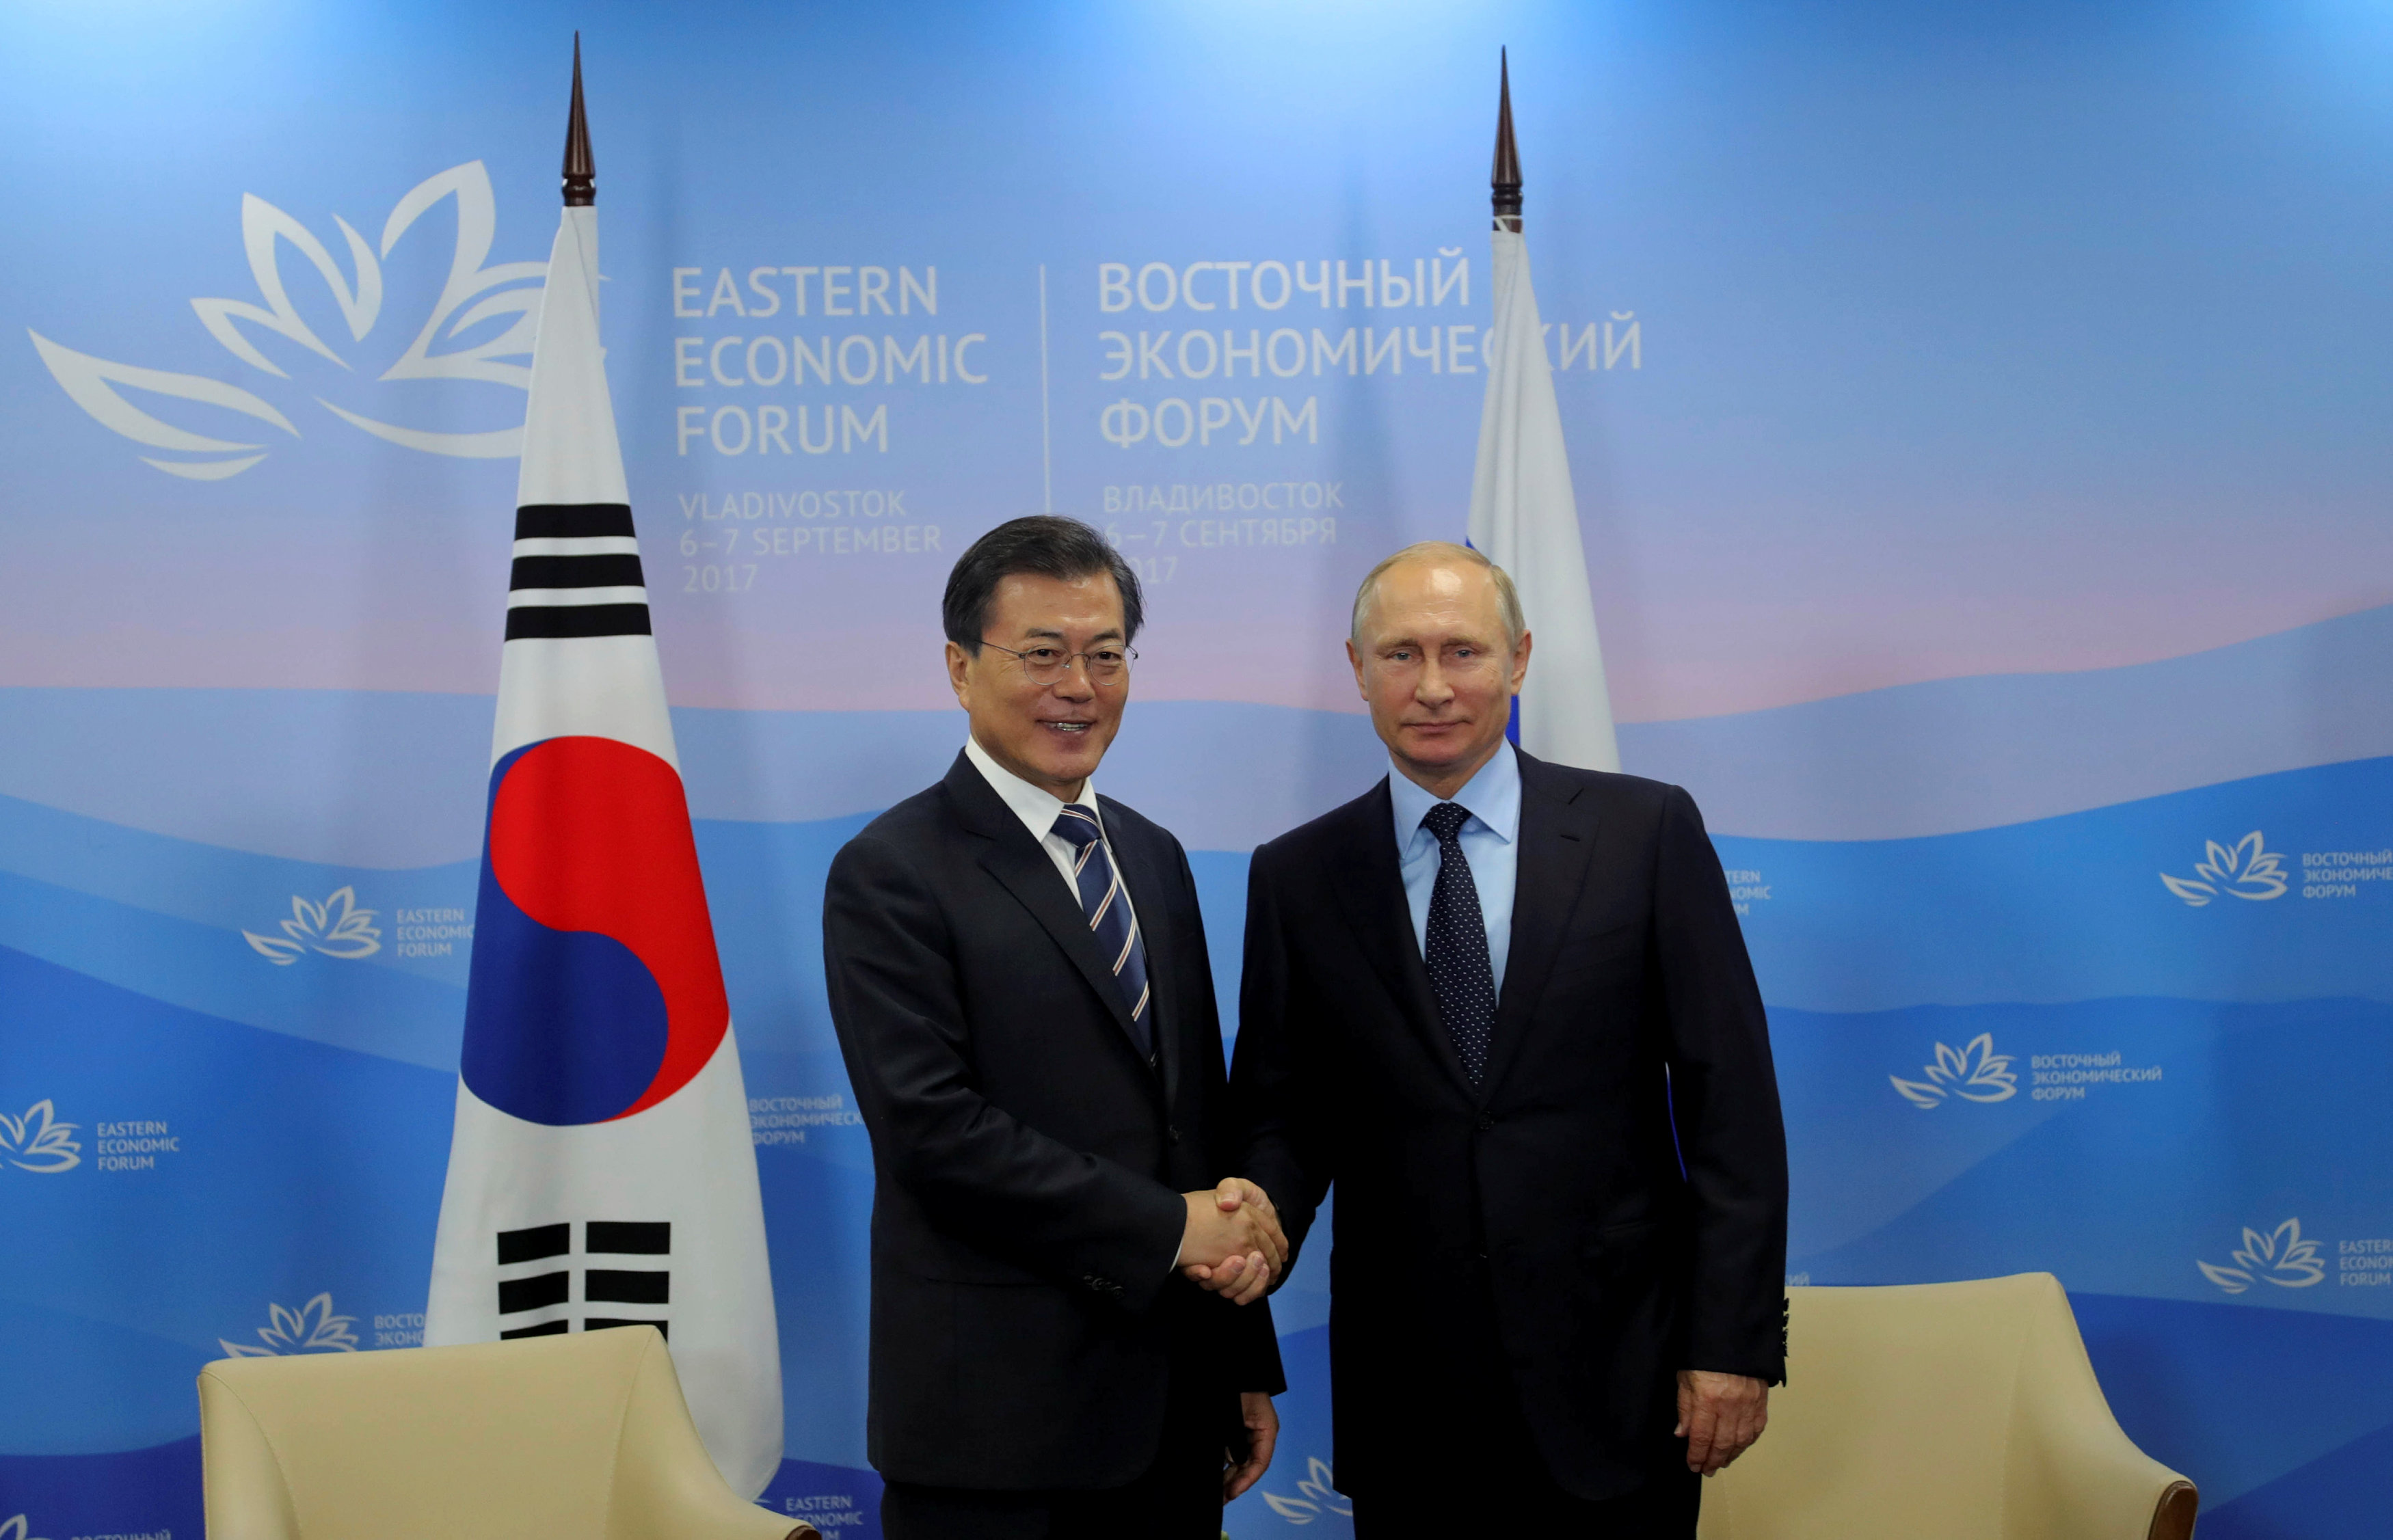 Sanctions, pressure alone will not resolve North Korea crisis, says Putin